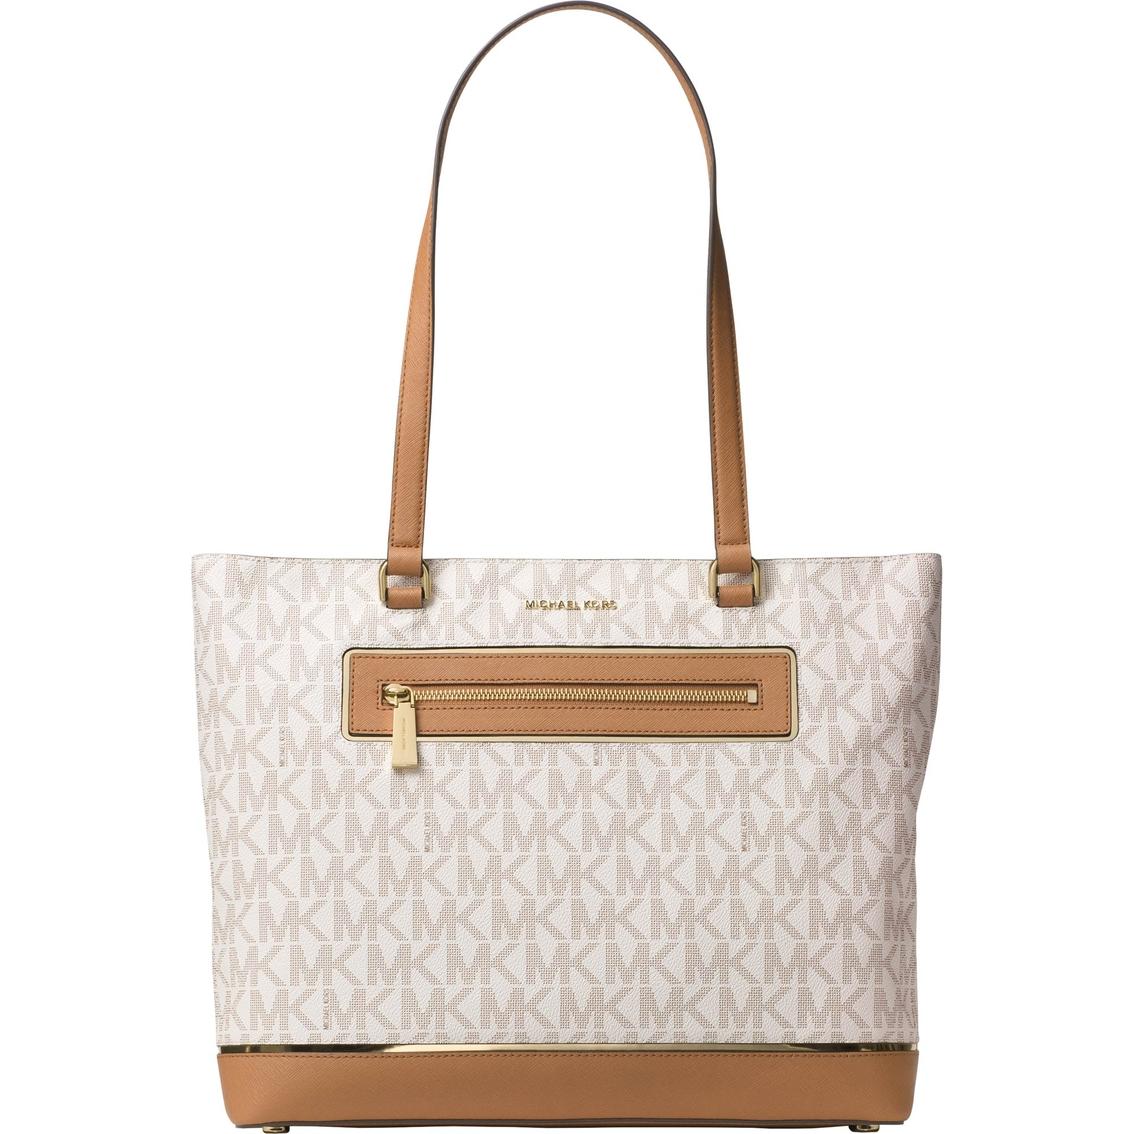 6deb1bd36be5 Michael Kors Frame Out Item Large North South Tote   Handbags   Shop ...